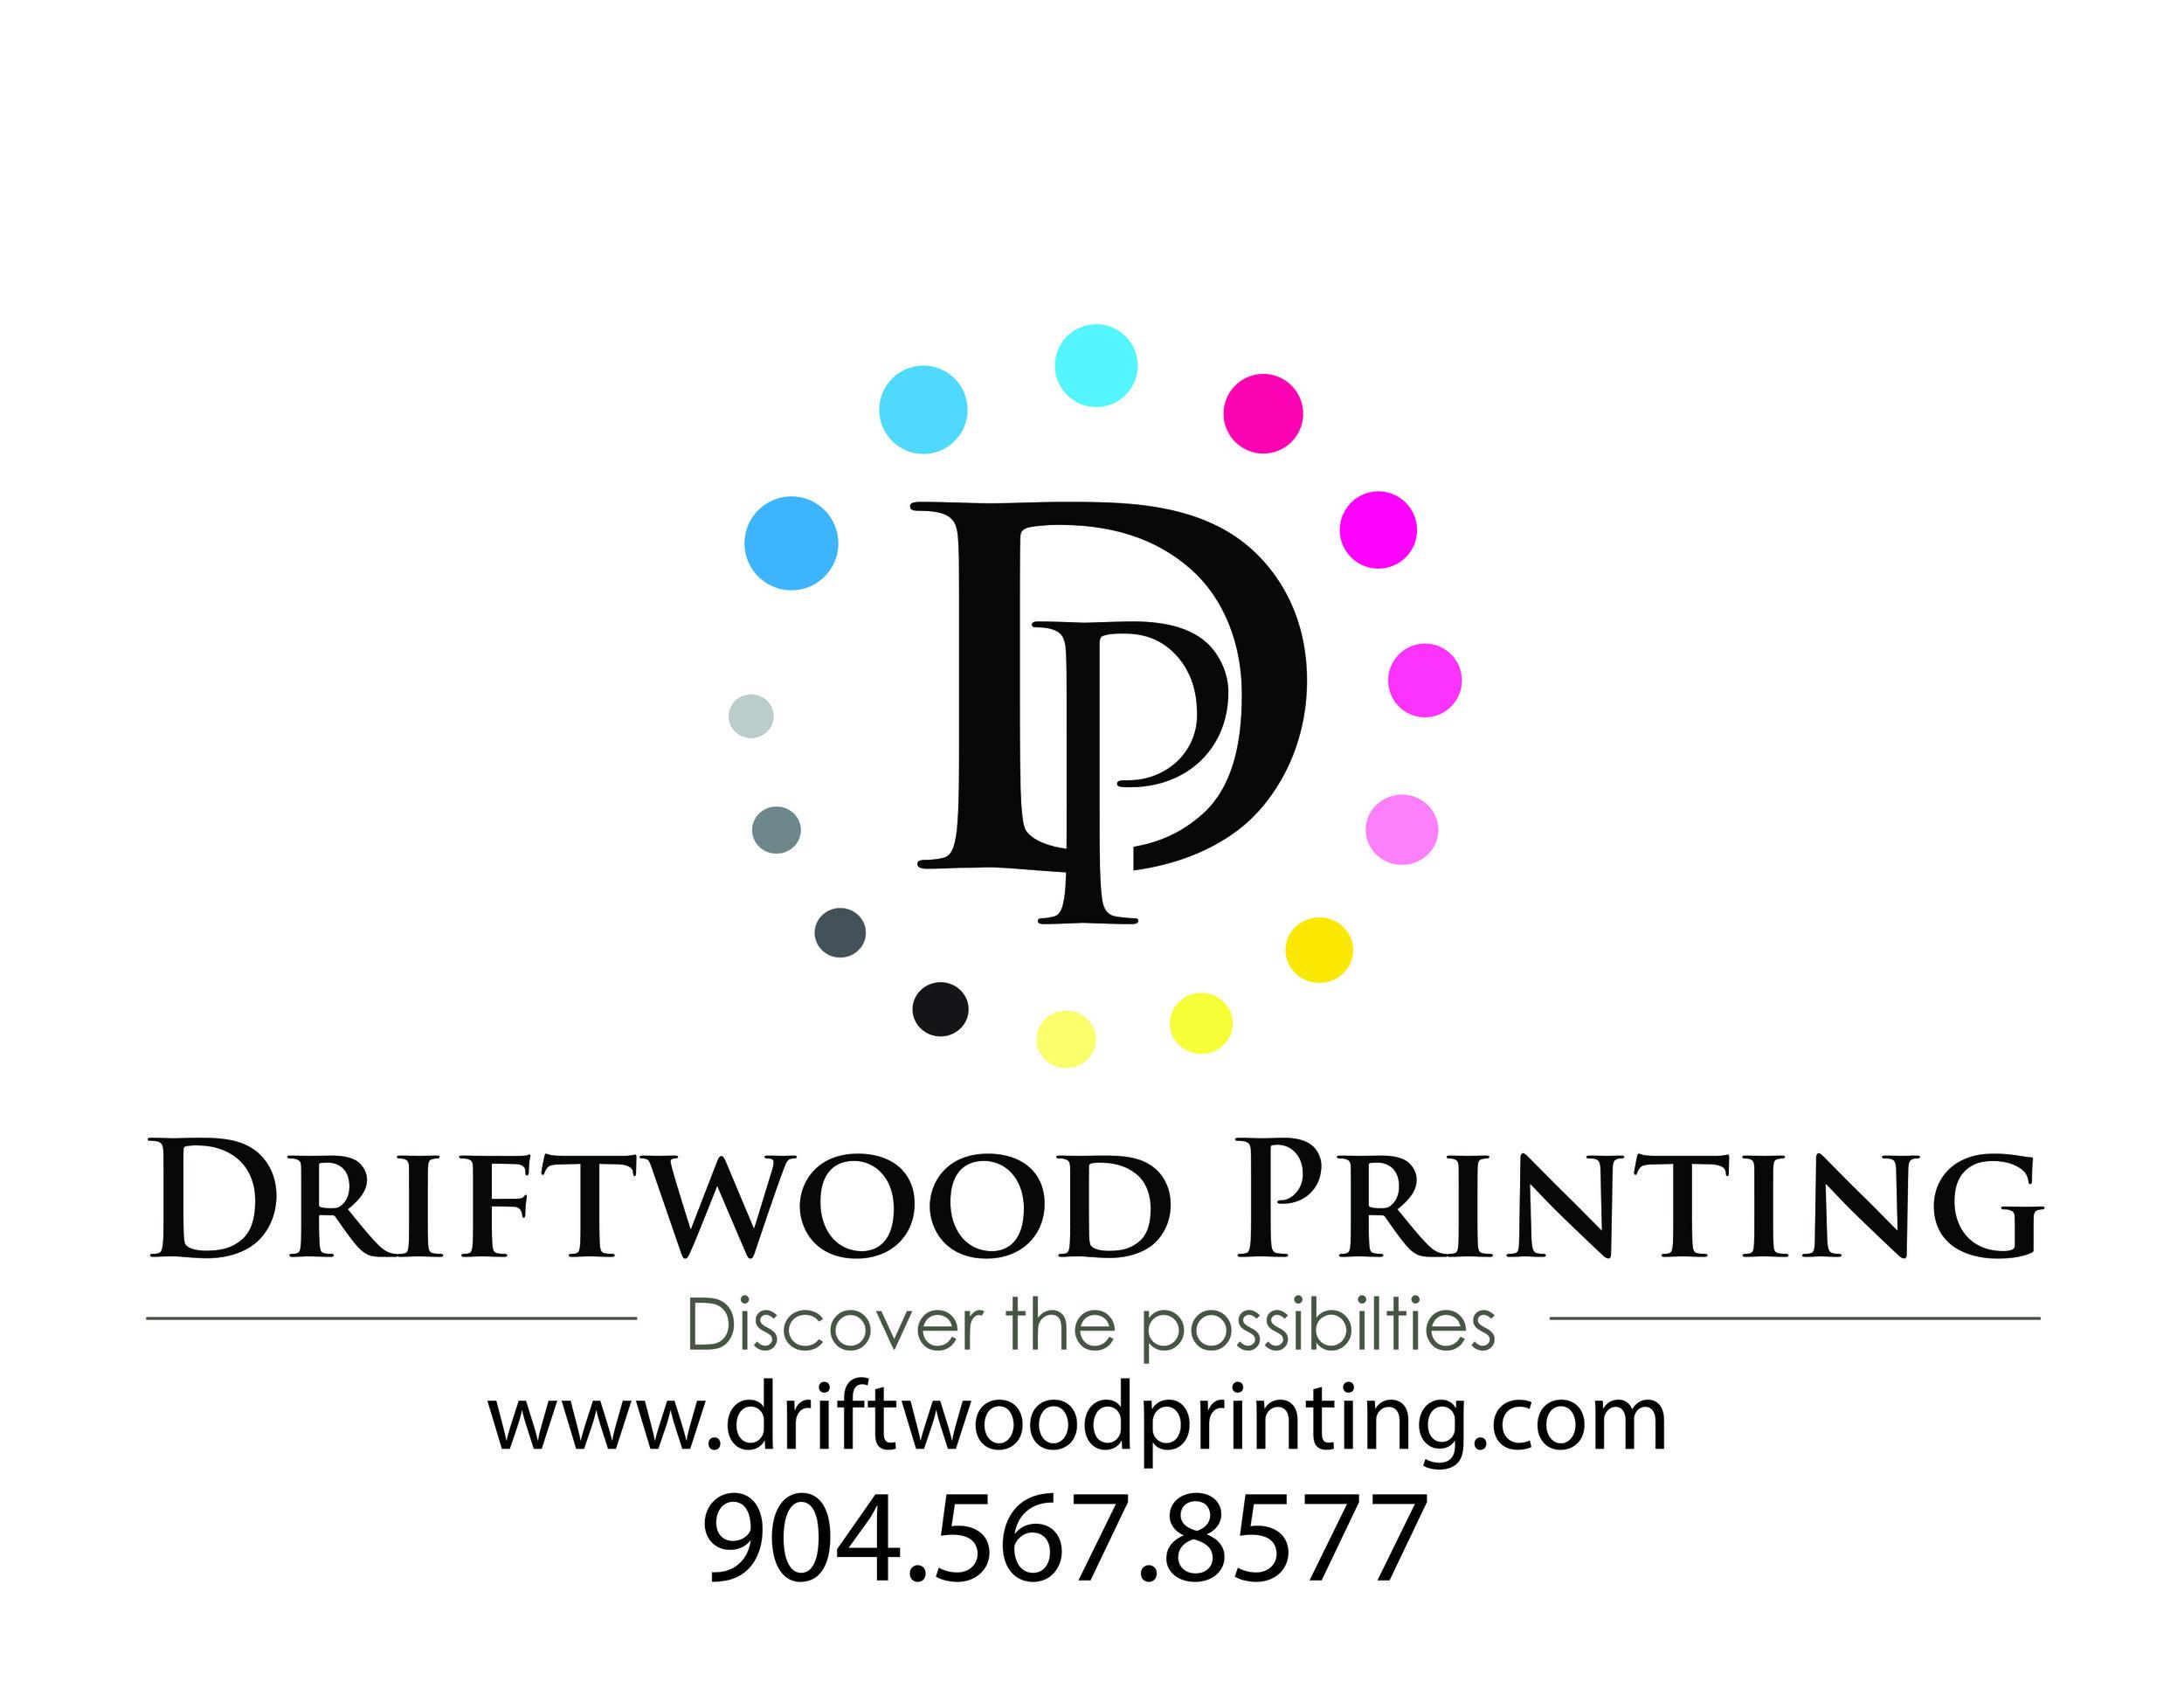 Driftwood printing Logo CMYK phone.jpg